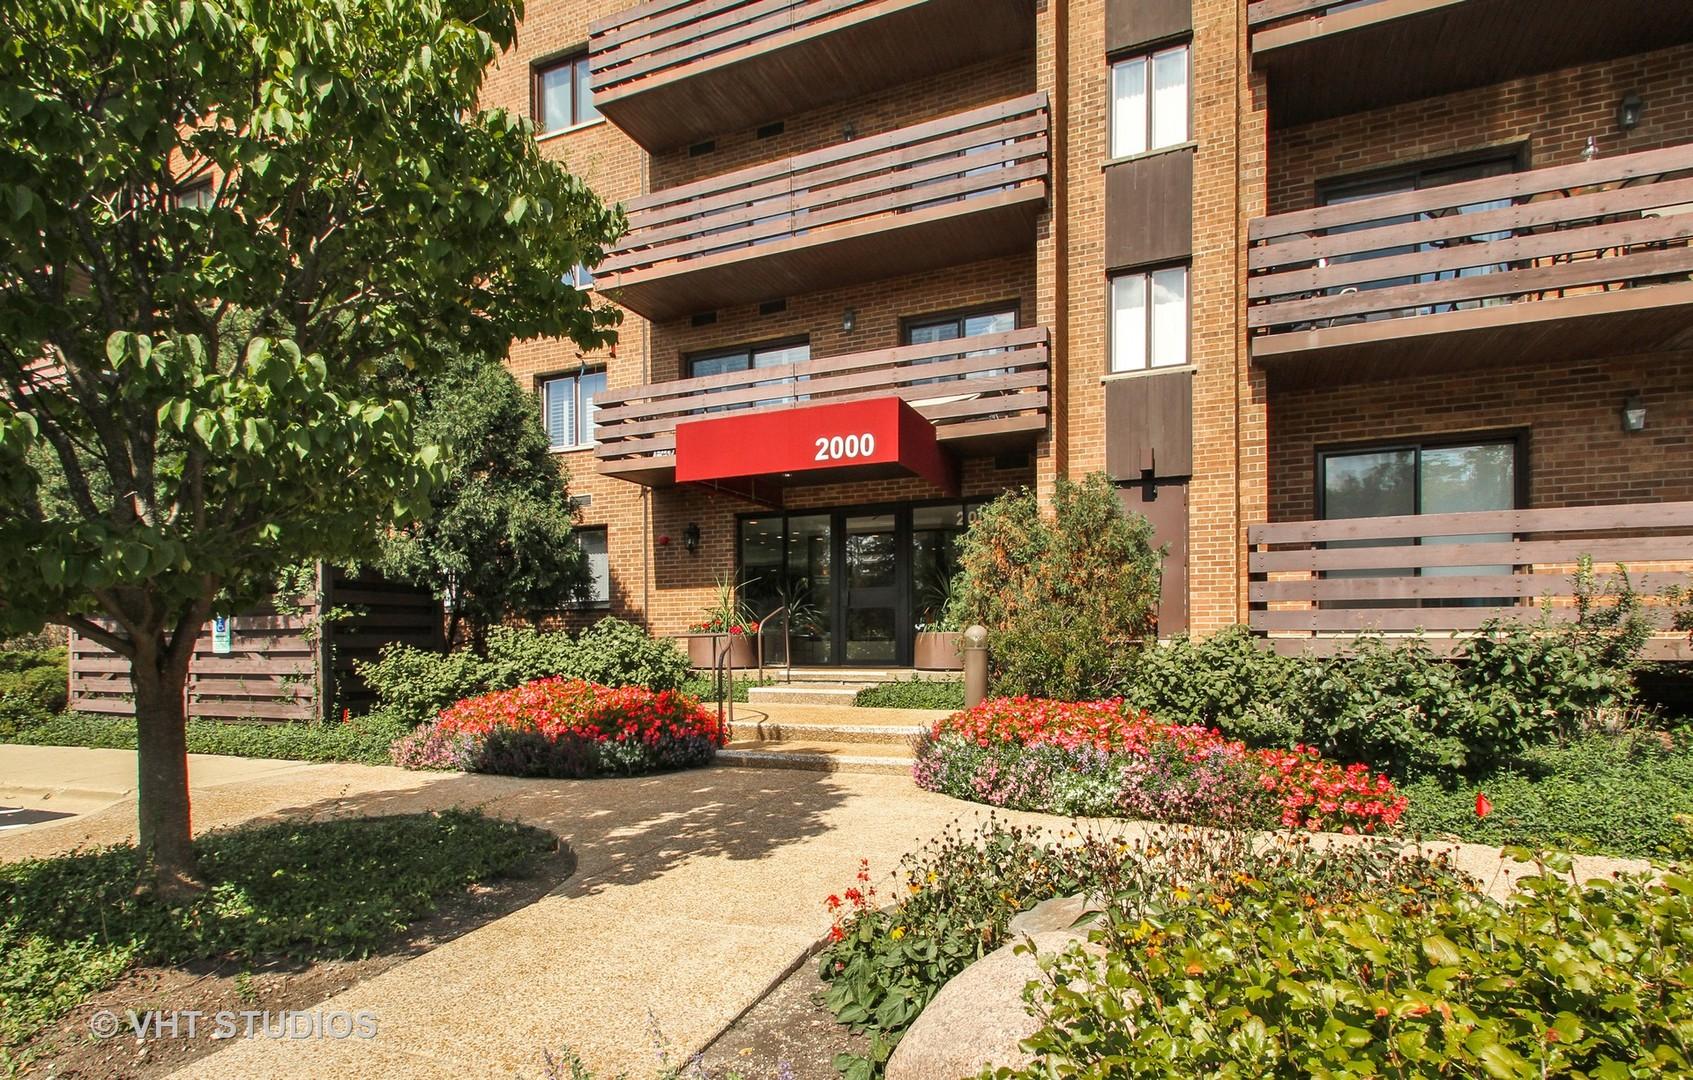 Glenview Illinois - Community Information - Real Estate - Schools ...